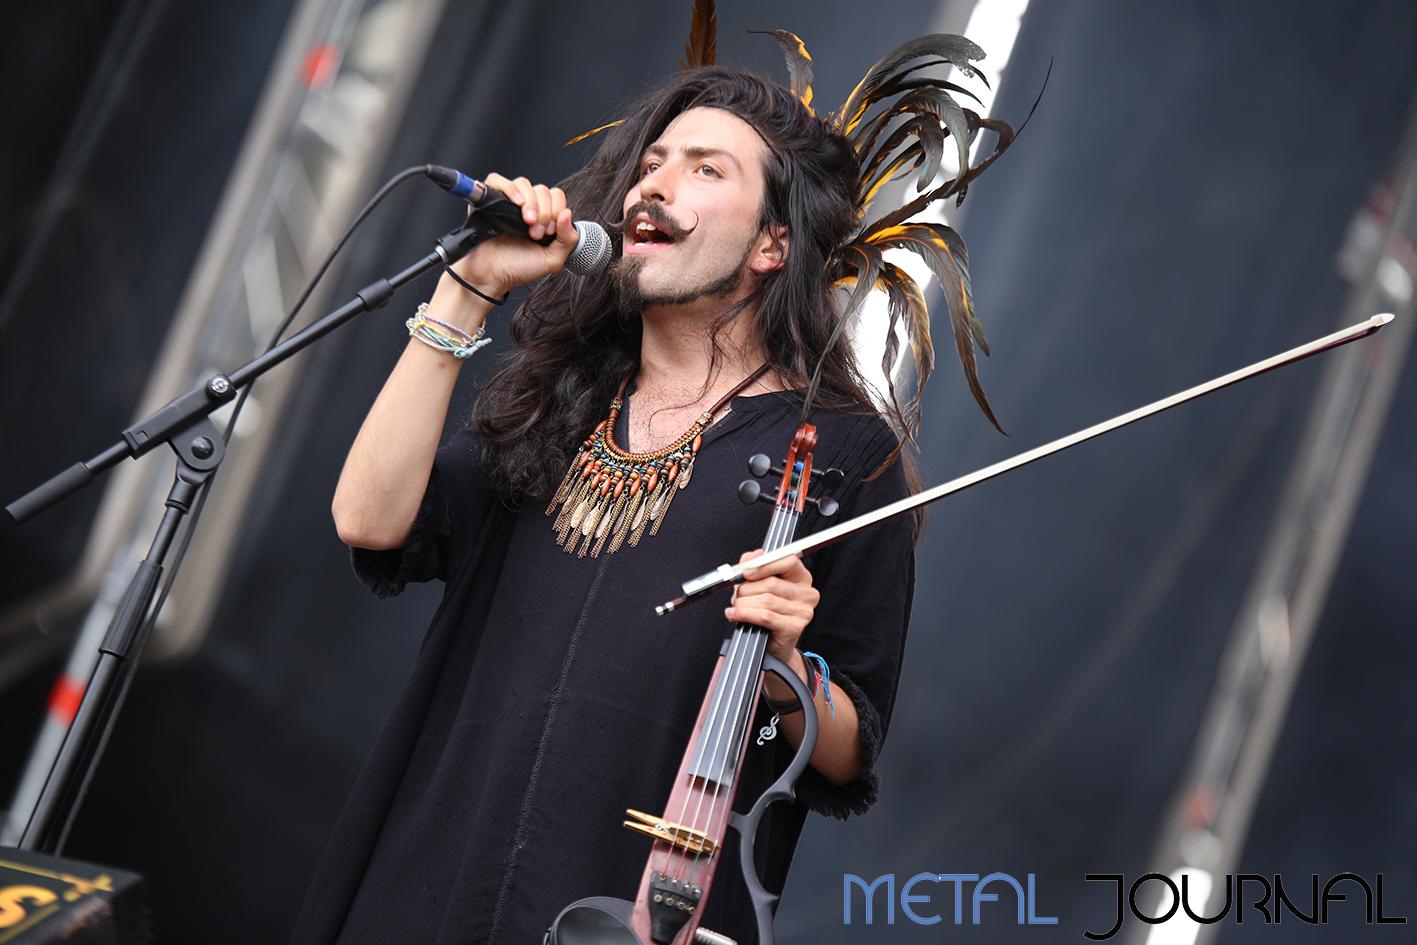 jose andrea uroboros - leyendas del rock 2019 metal journal pic 4